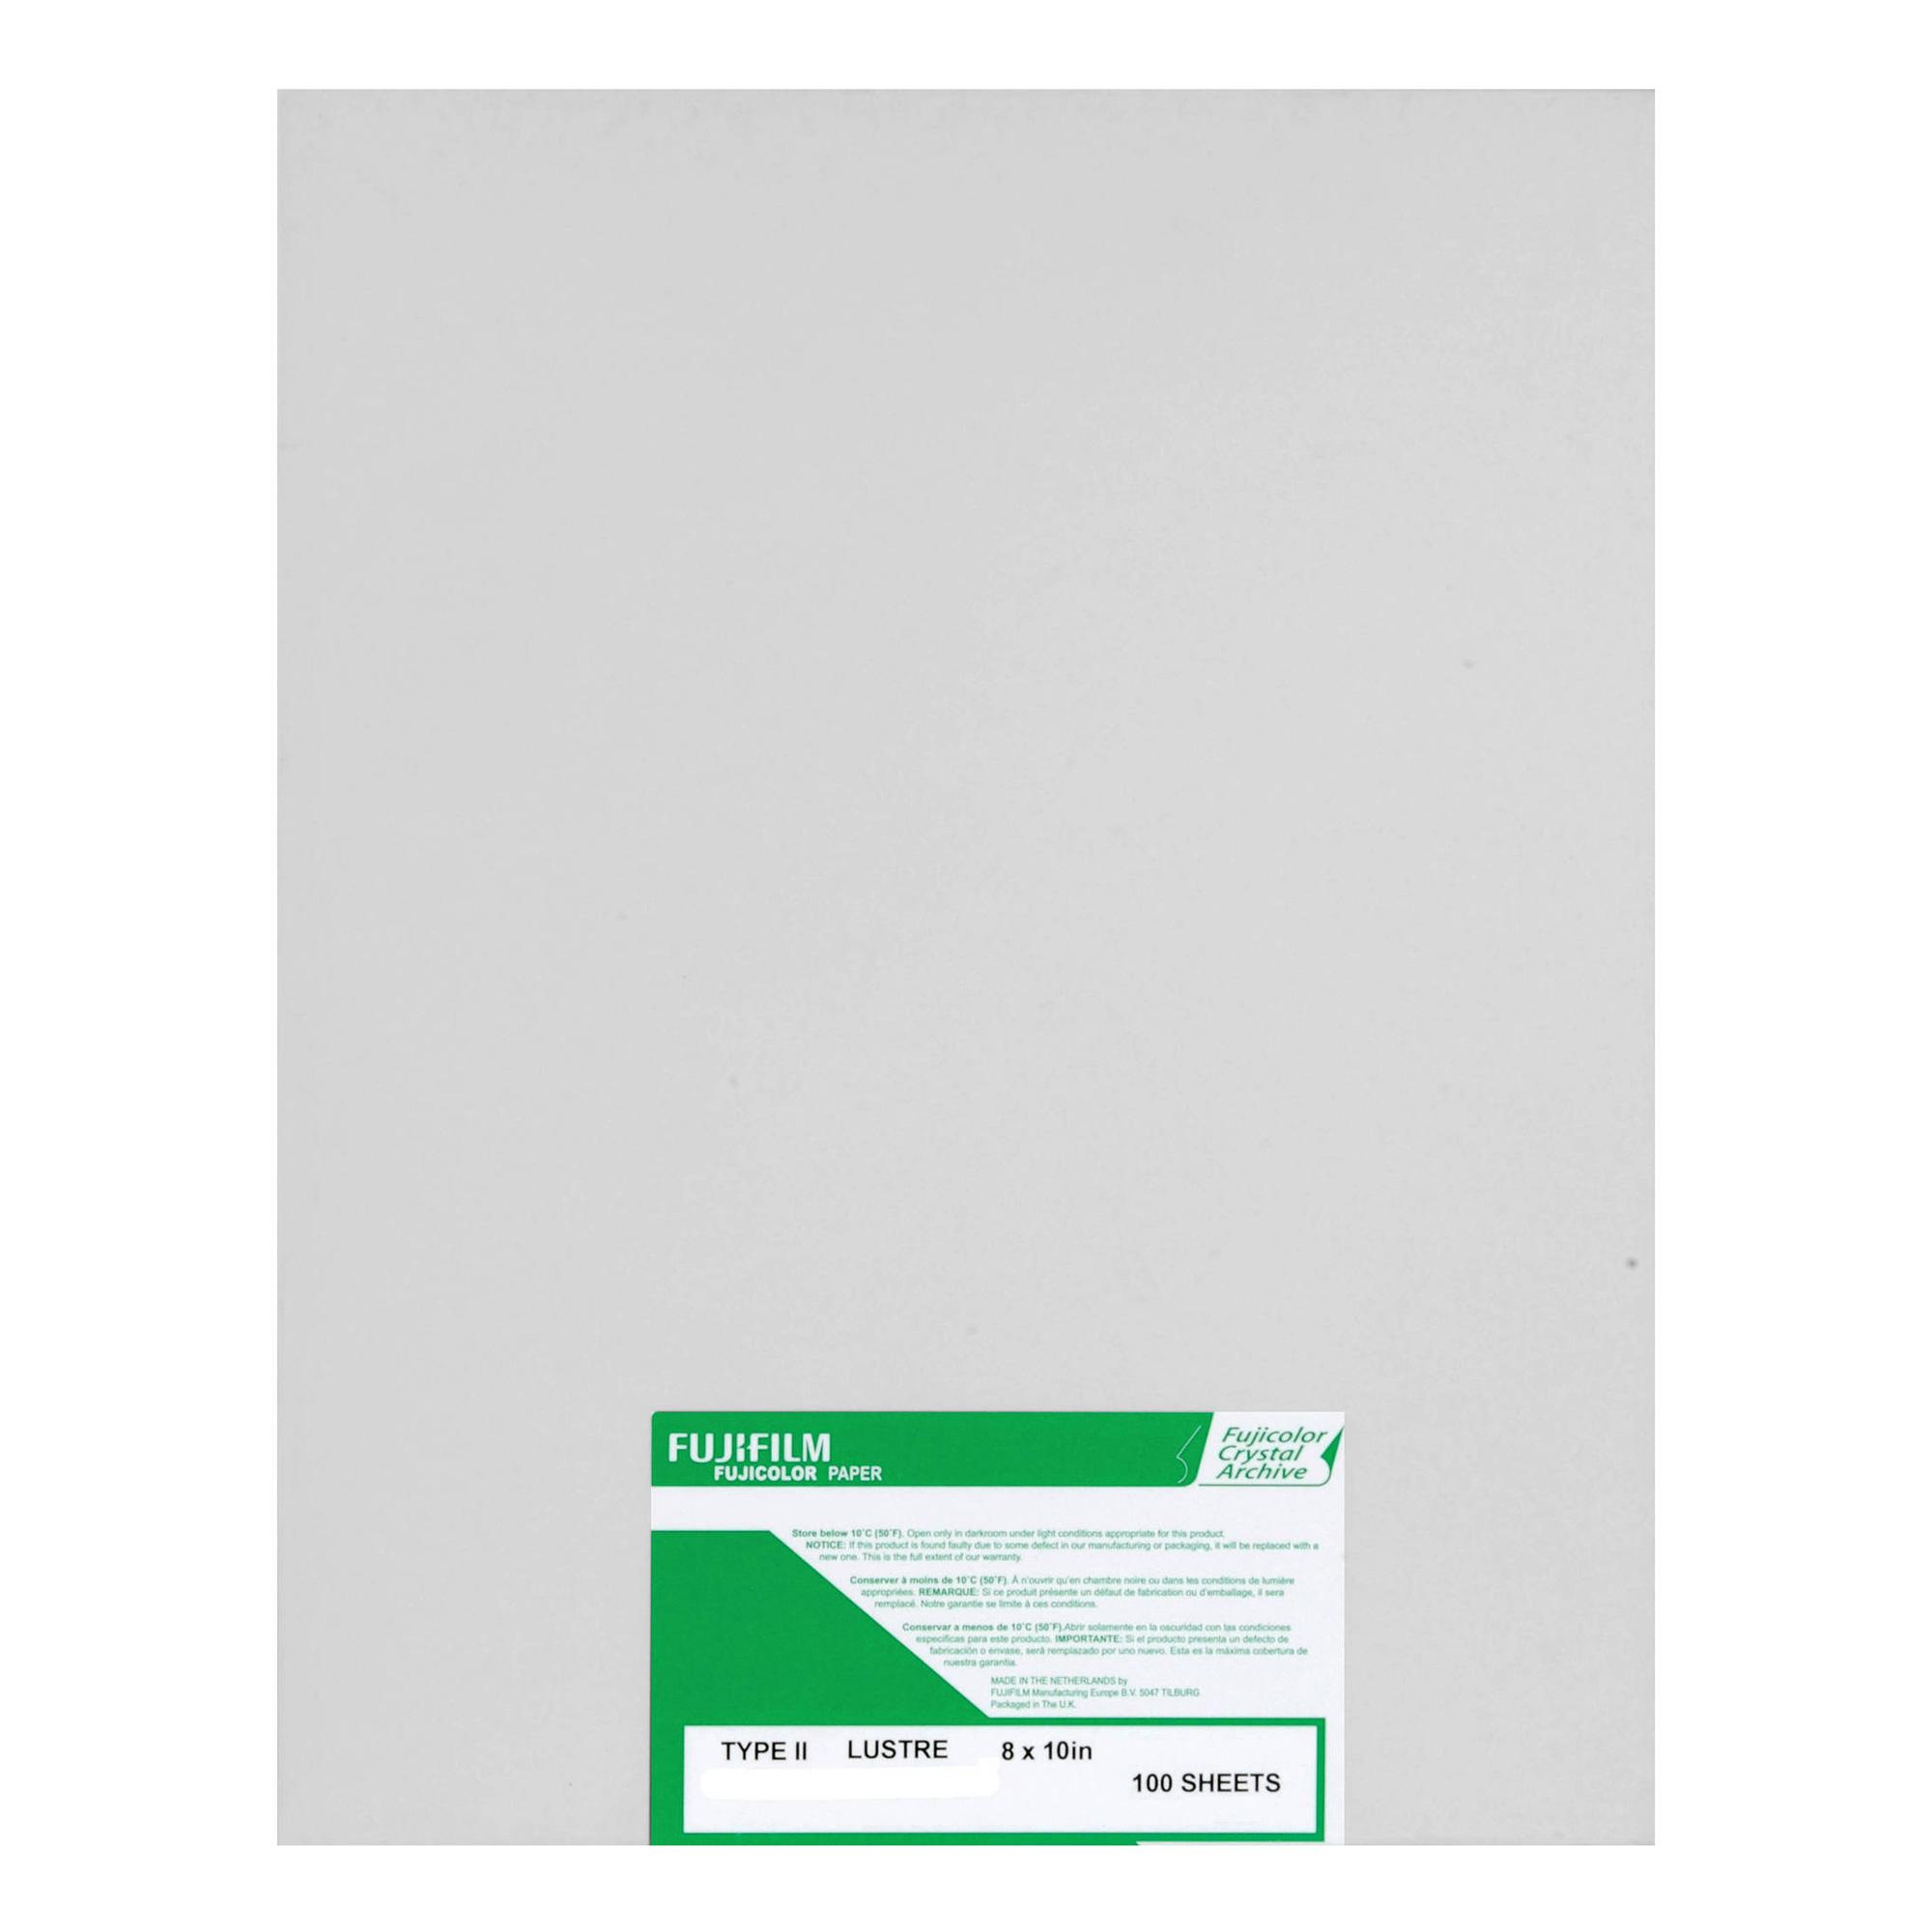 8 x 10, Lustre, 100 Sheets Fujifilm/Fujicolor Crystal Archive Type II Paper